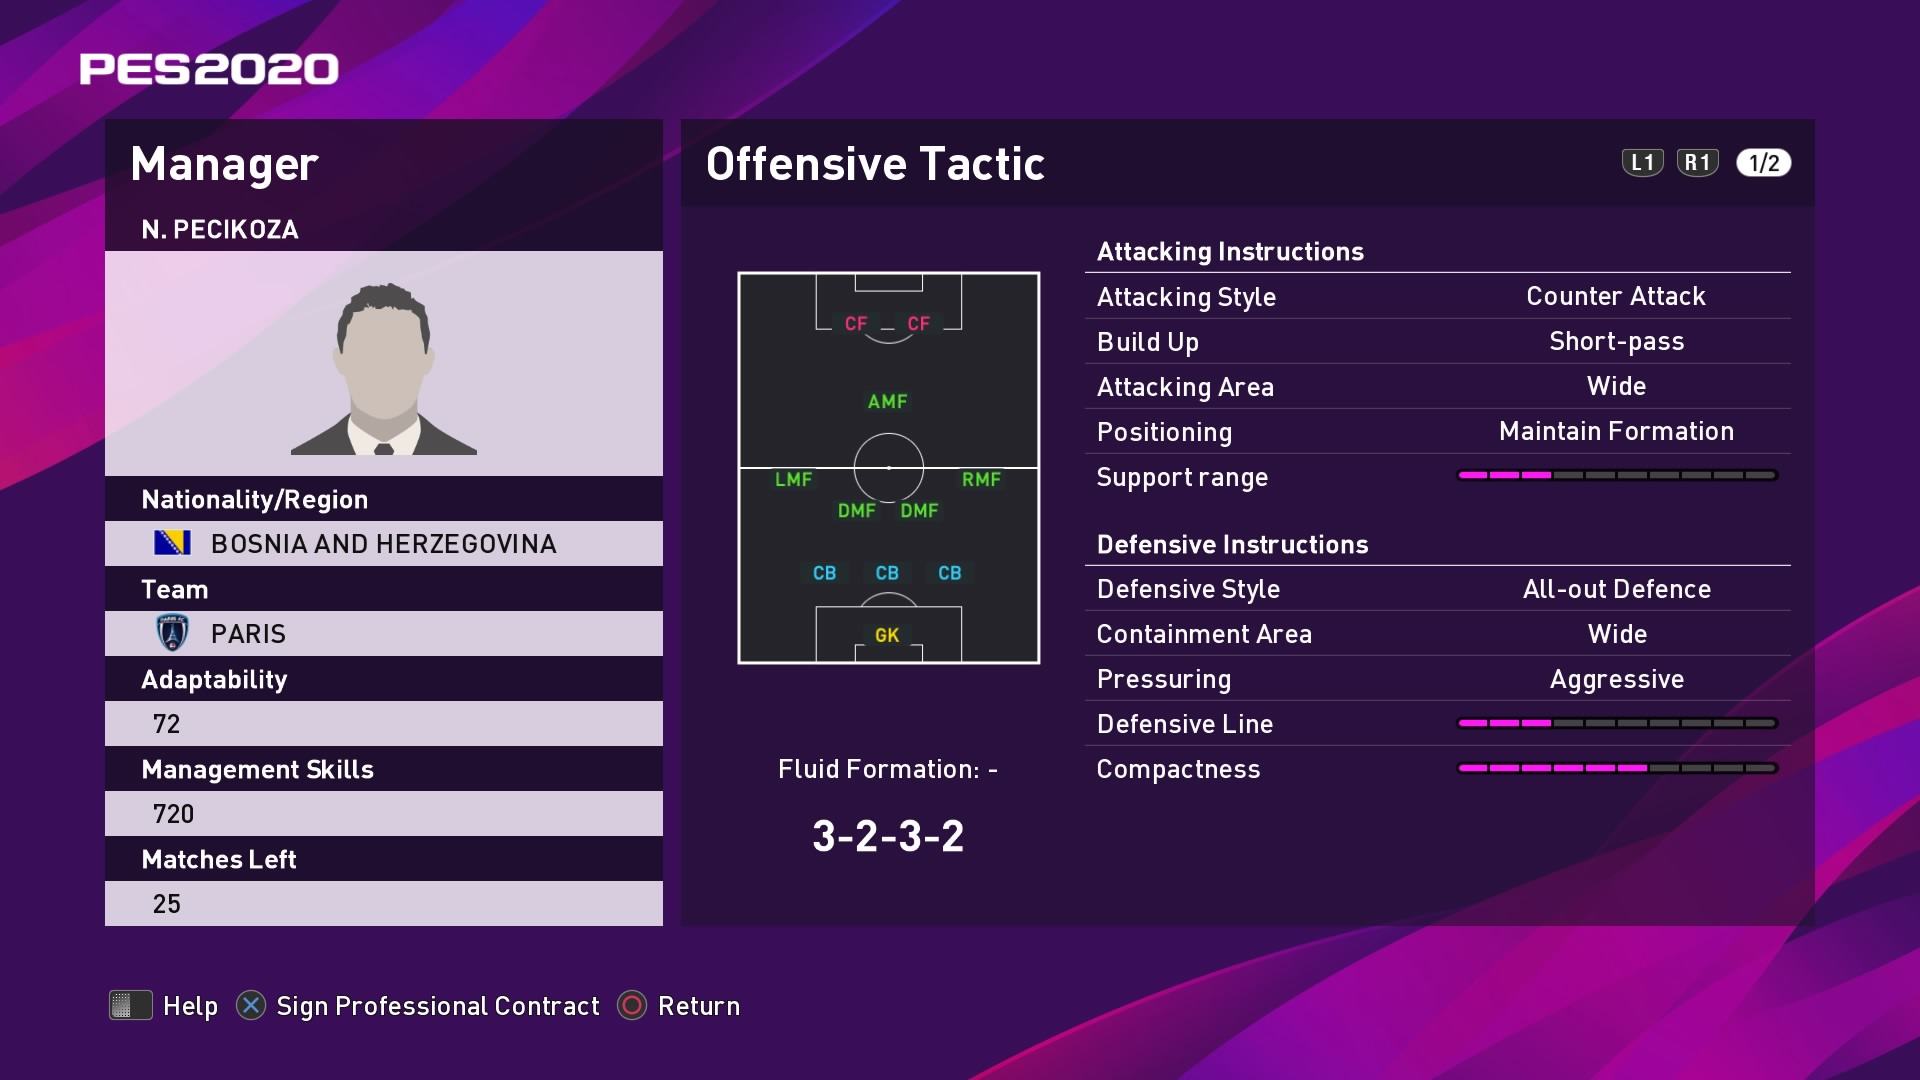 N. Pecikoza (Mehmed Baždarević) Offensive Tactic in PES 2020 myClub